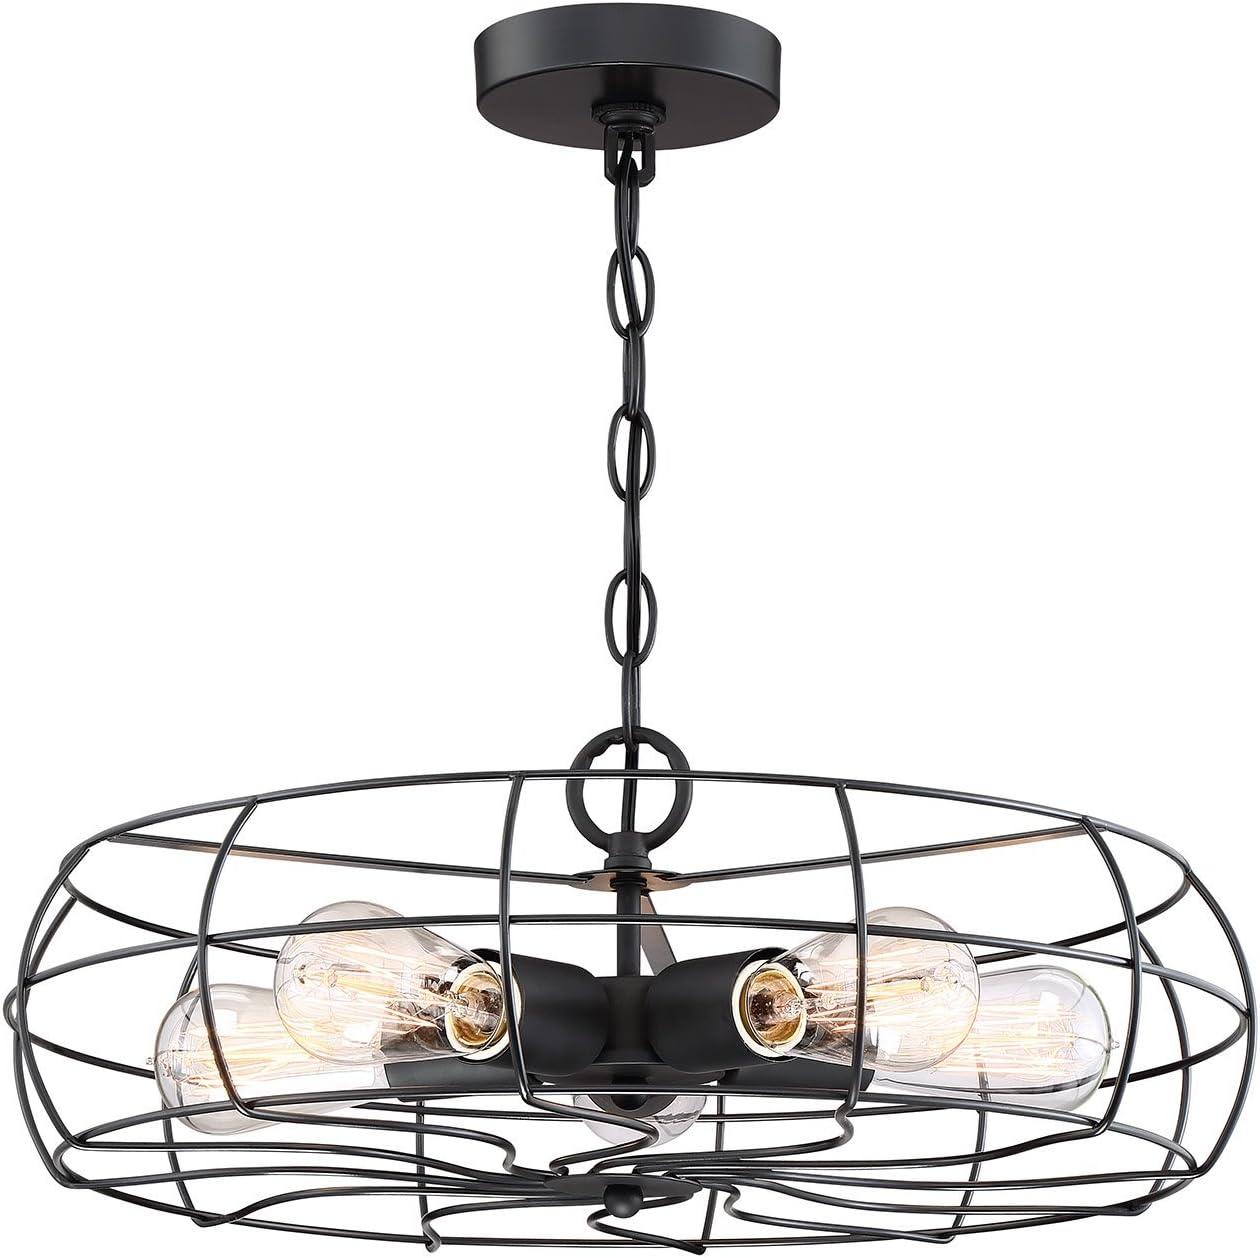 Kira Home Gage 18 Industrial 5-Light Fan Chandelier Fan Style Metal Cage Dimmable Adjustable Height Matte Black Finish